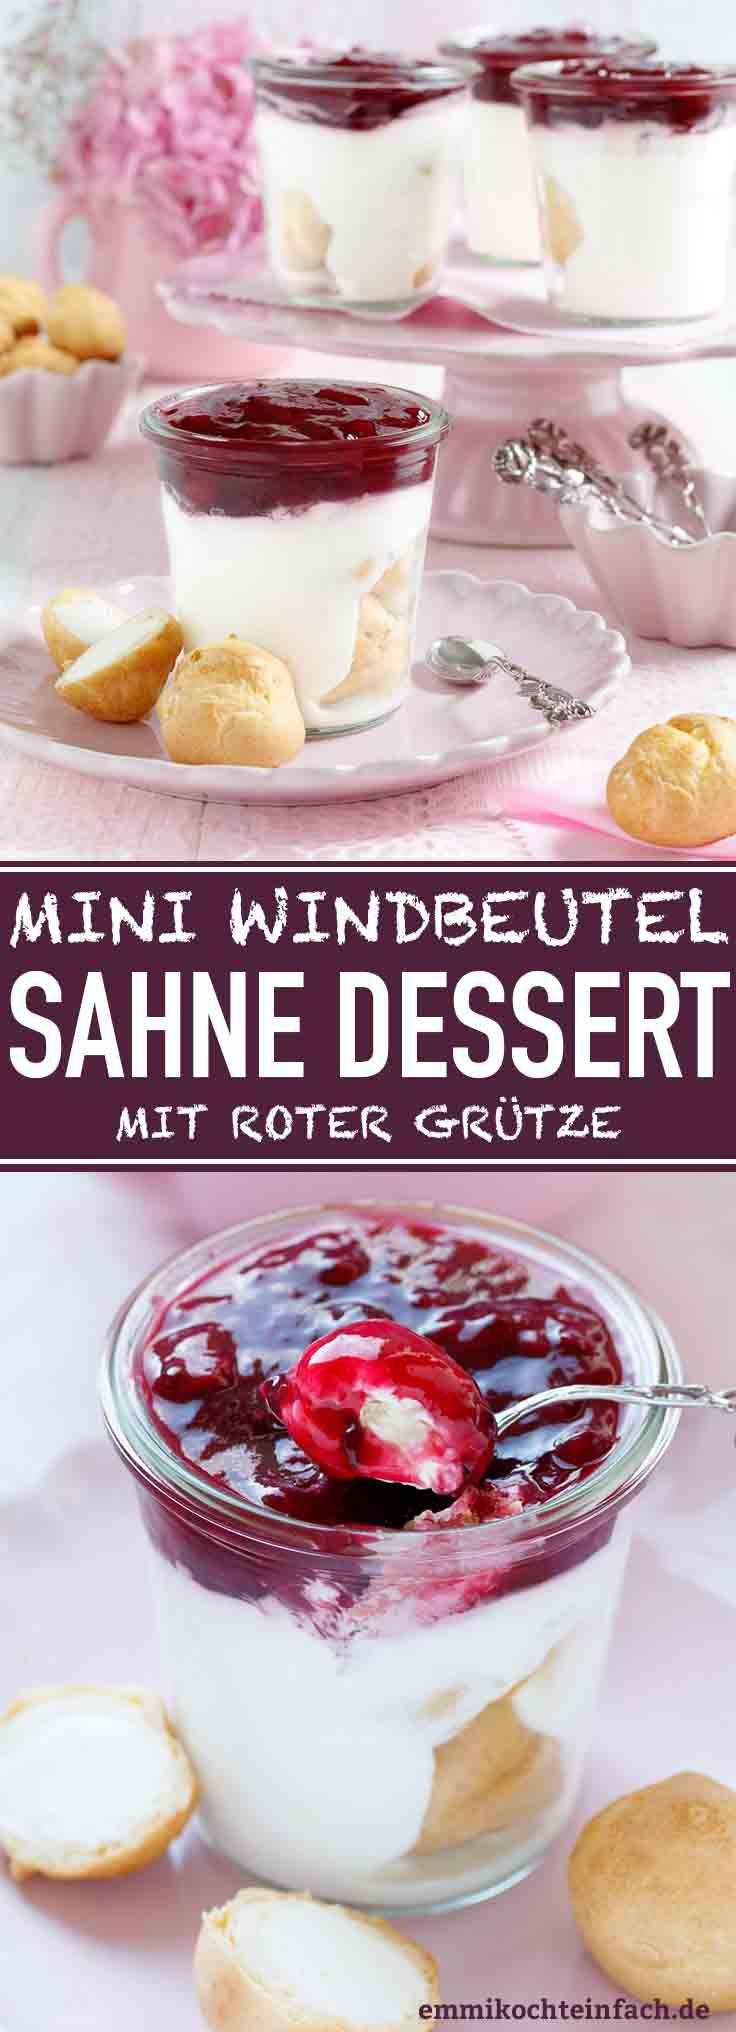 Mini-Windbeutel Sahnedessert mit roter Grütze #cremepuff